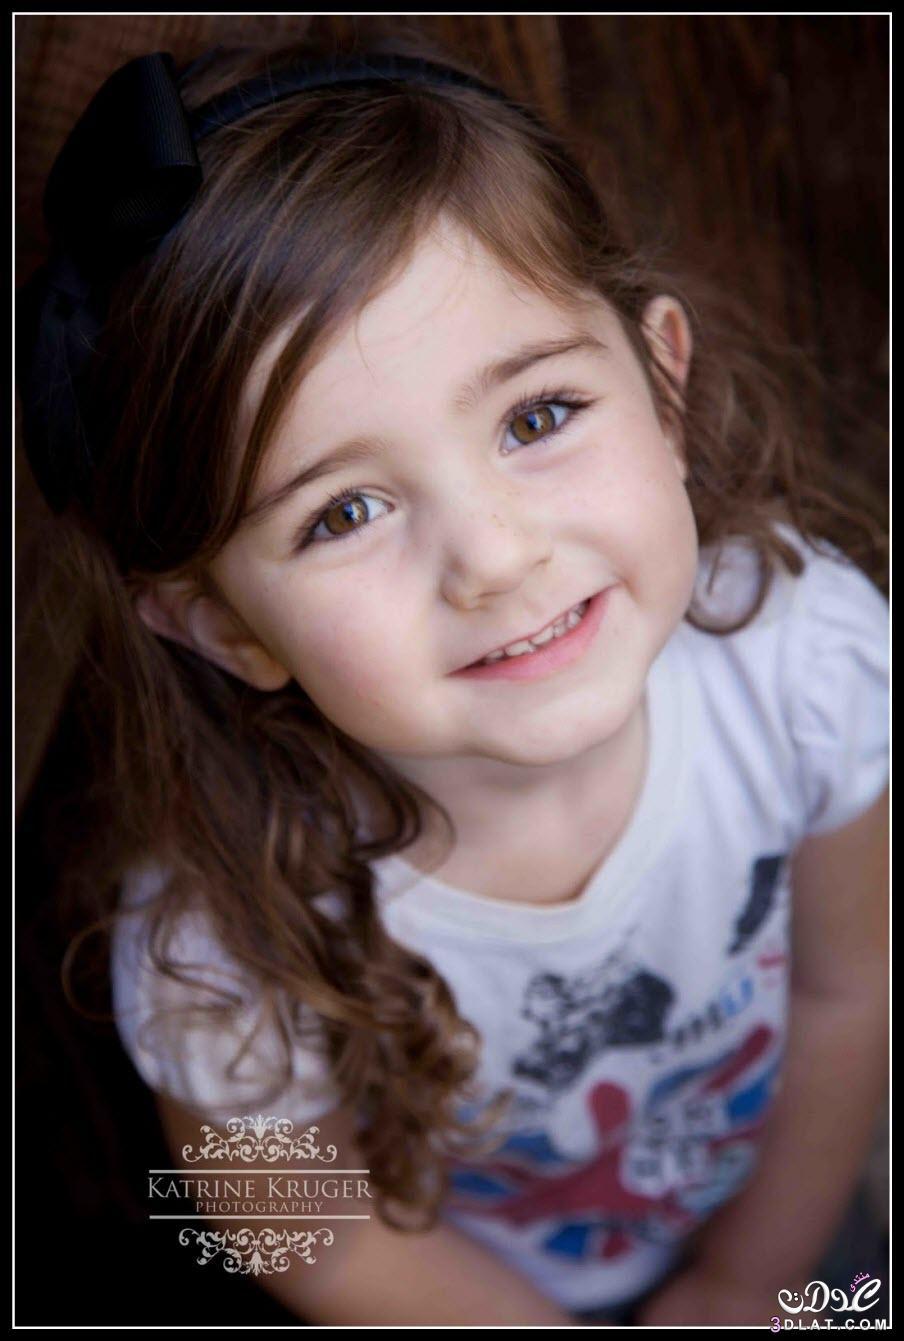 صور اطفال صور بيبي صور اولاد صور حلوين اطفال حلوينصور اطفال صغار2020 6